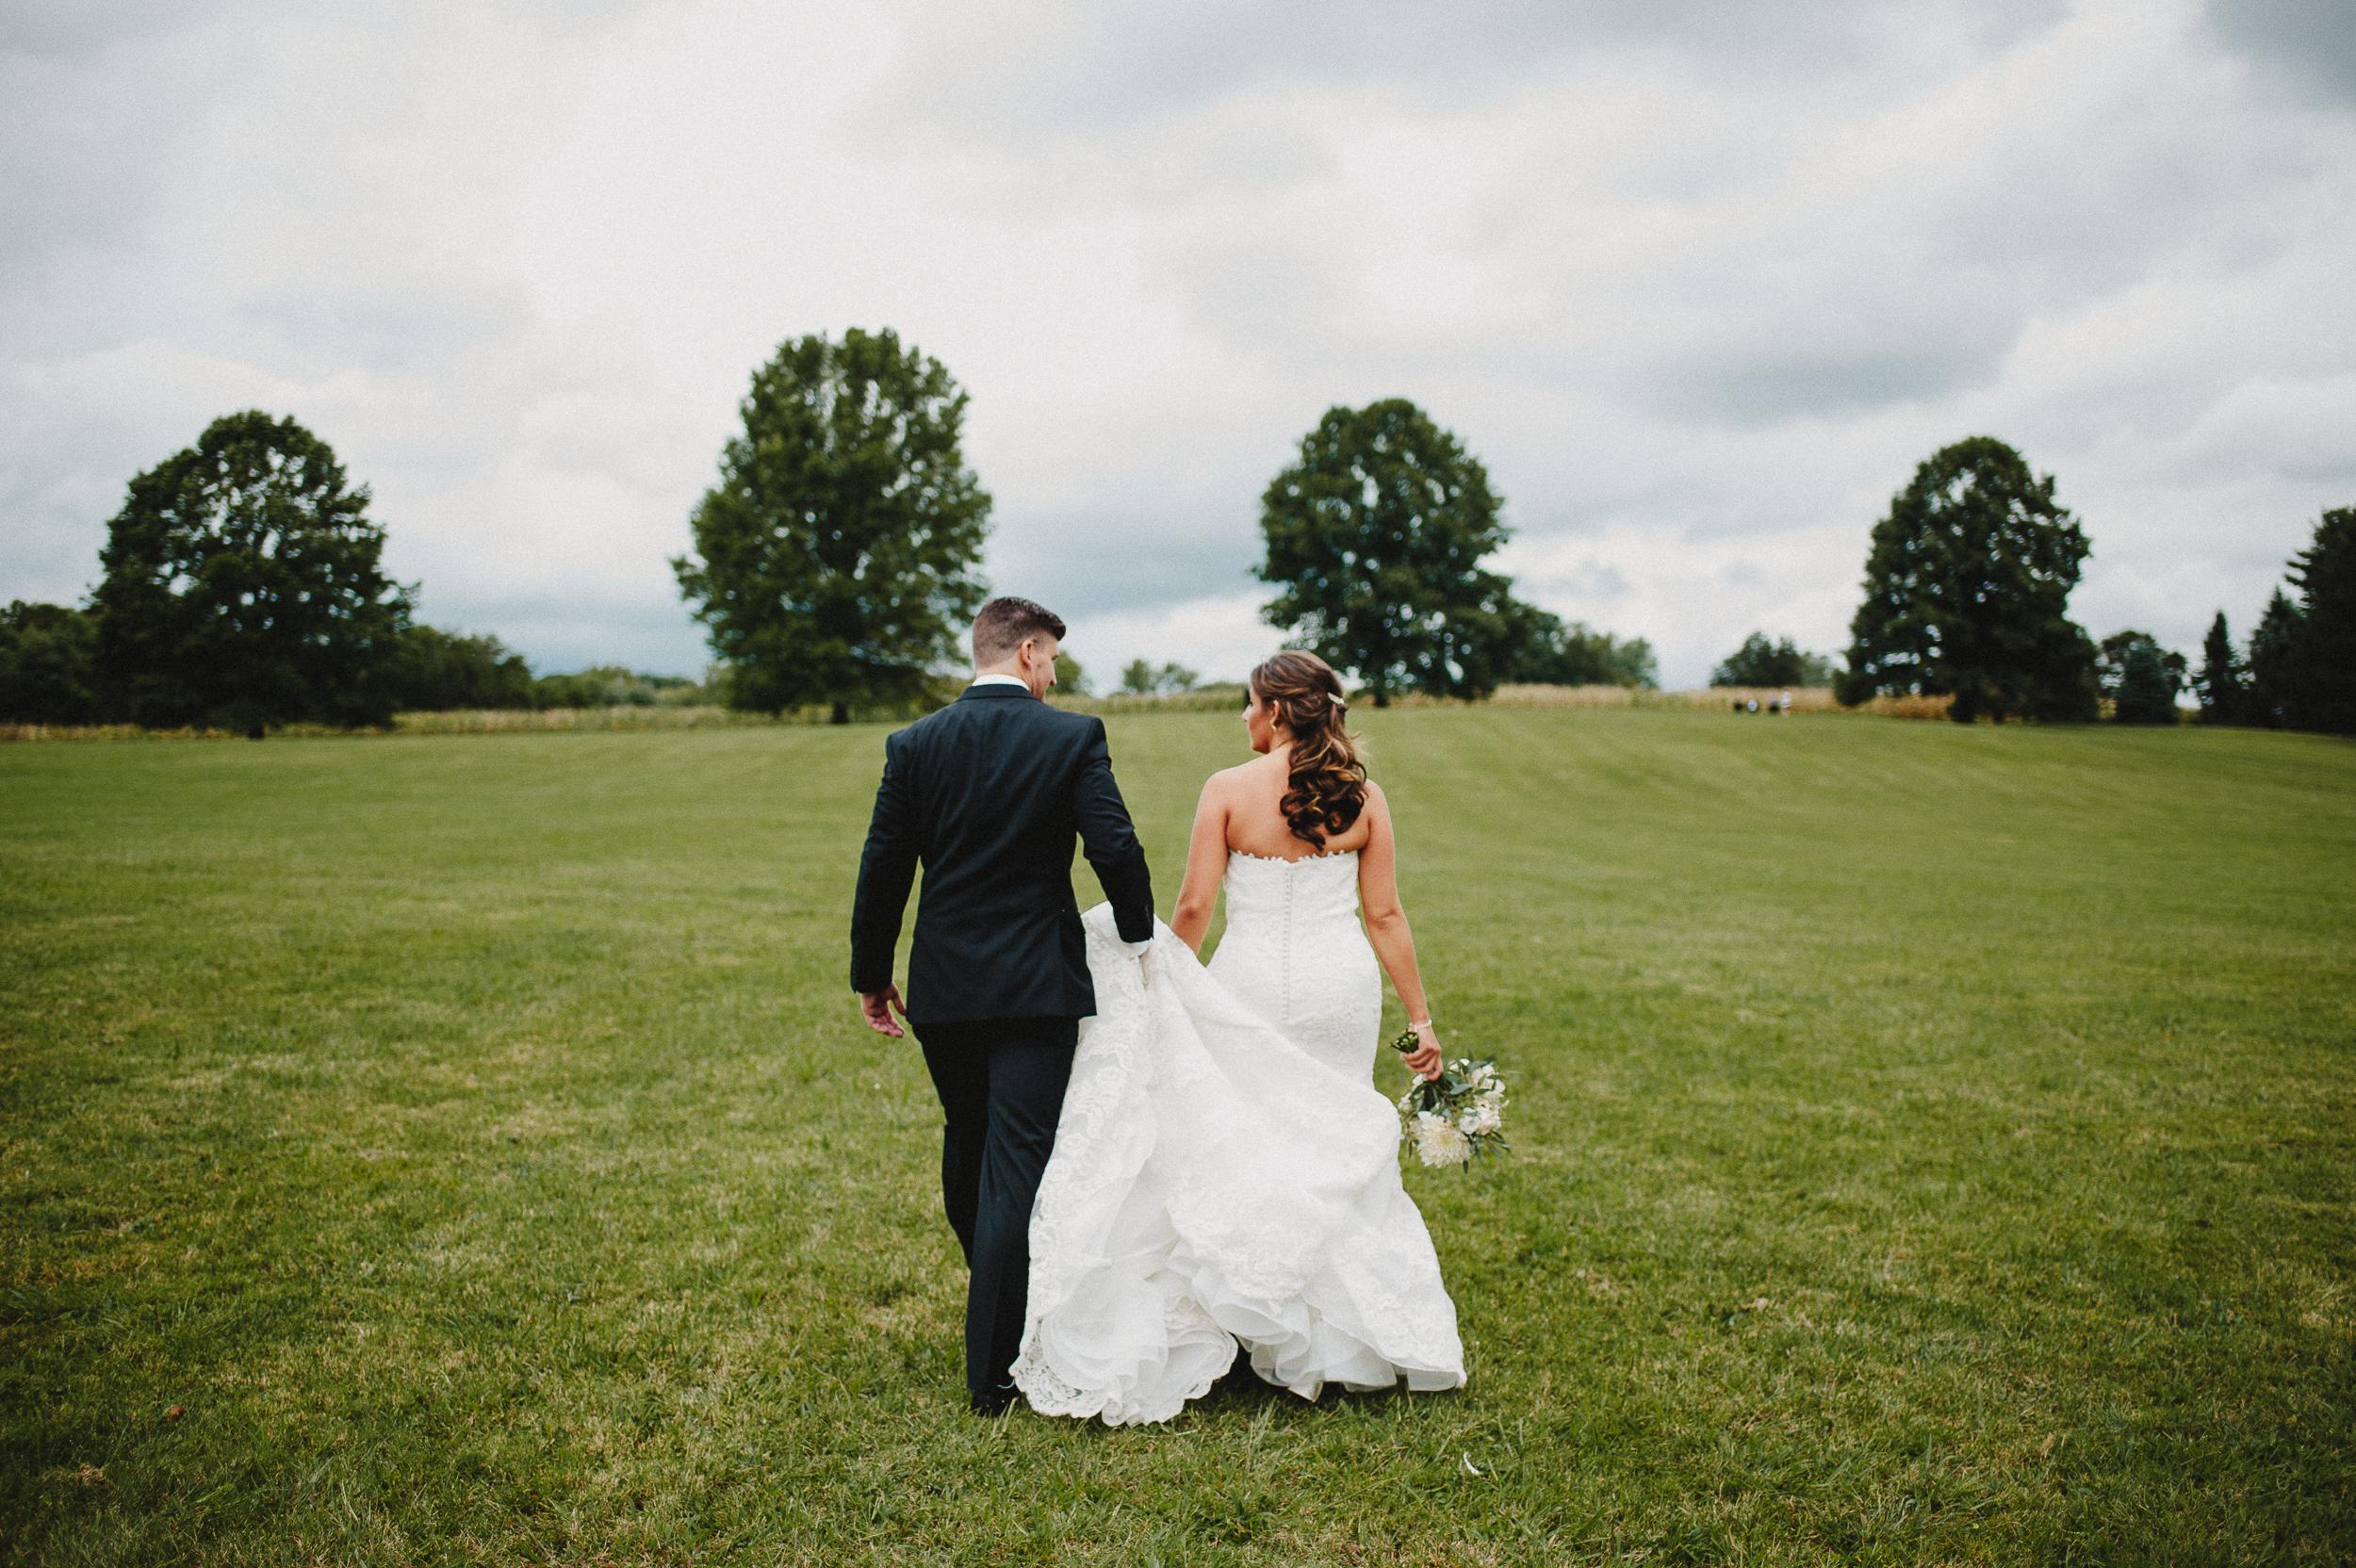 delaware-estate-wedding-photographer-pat-robinson-photography-56.jpg